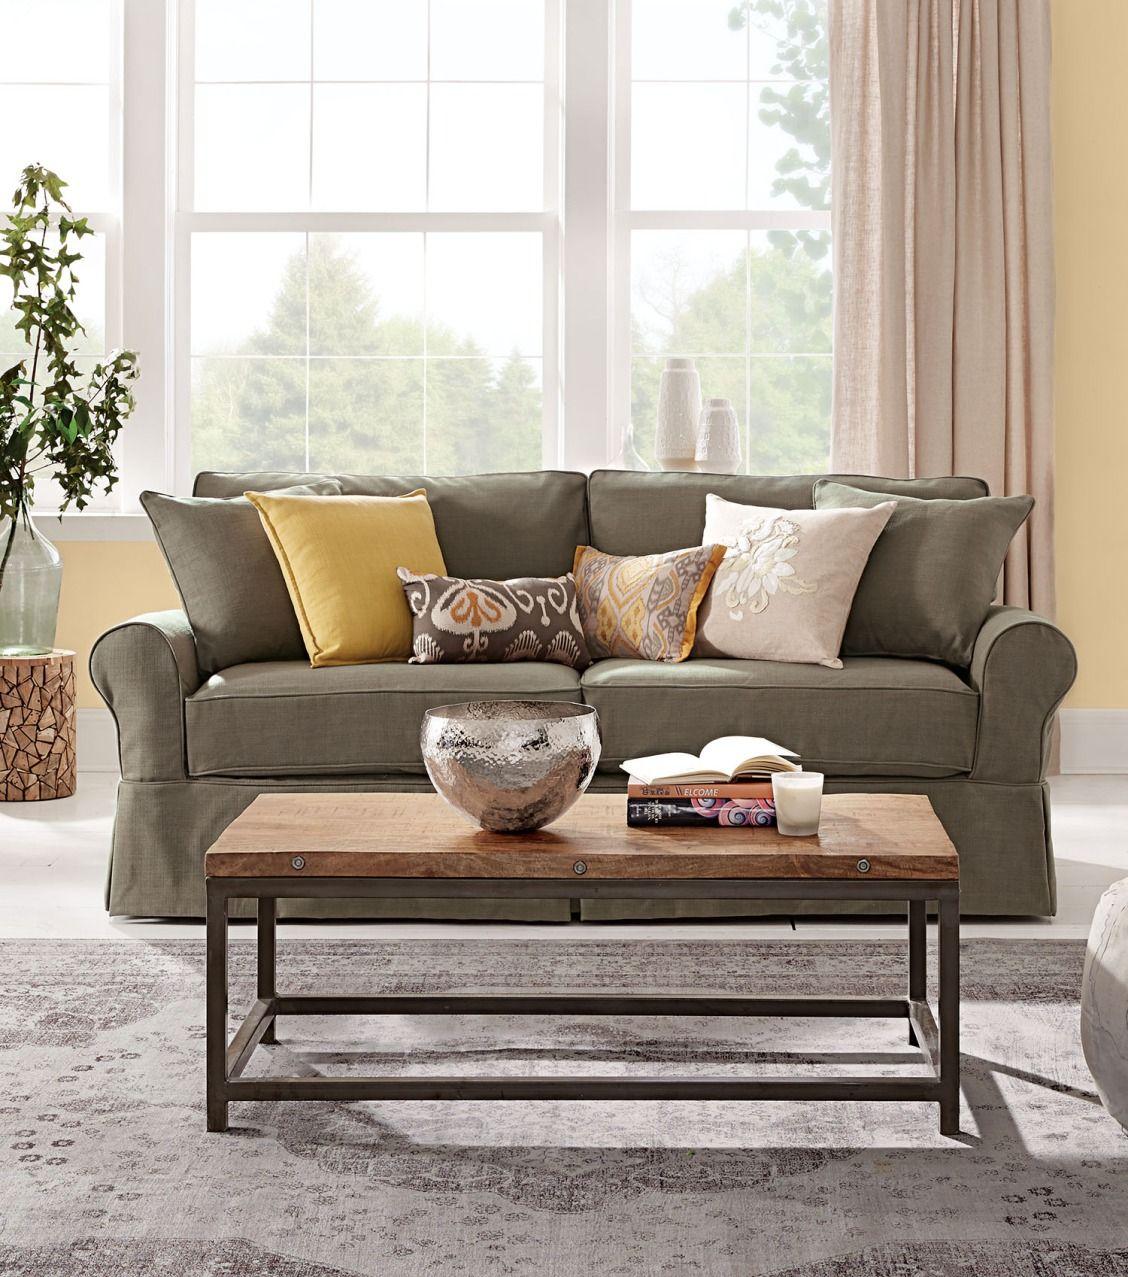 Home Decorators Collection Mayfair Pearl Linen Fabric Sofa: Mayfair Classic Smoke Twill Fabric Sofa